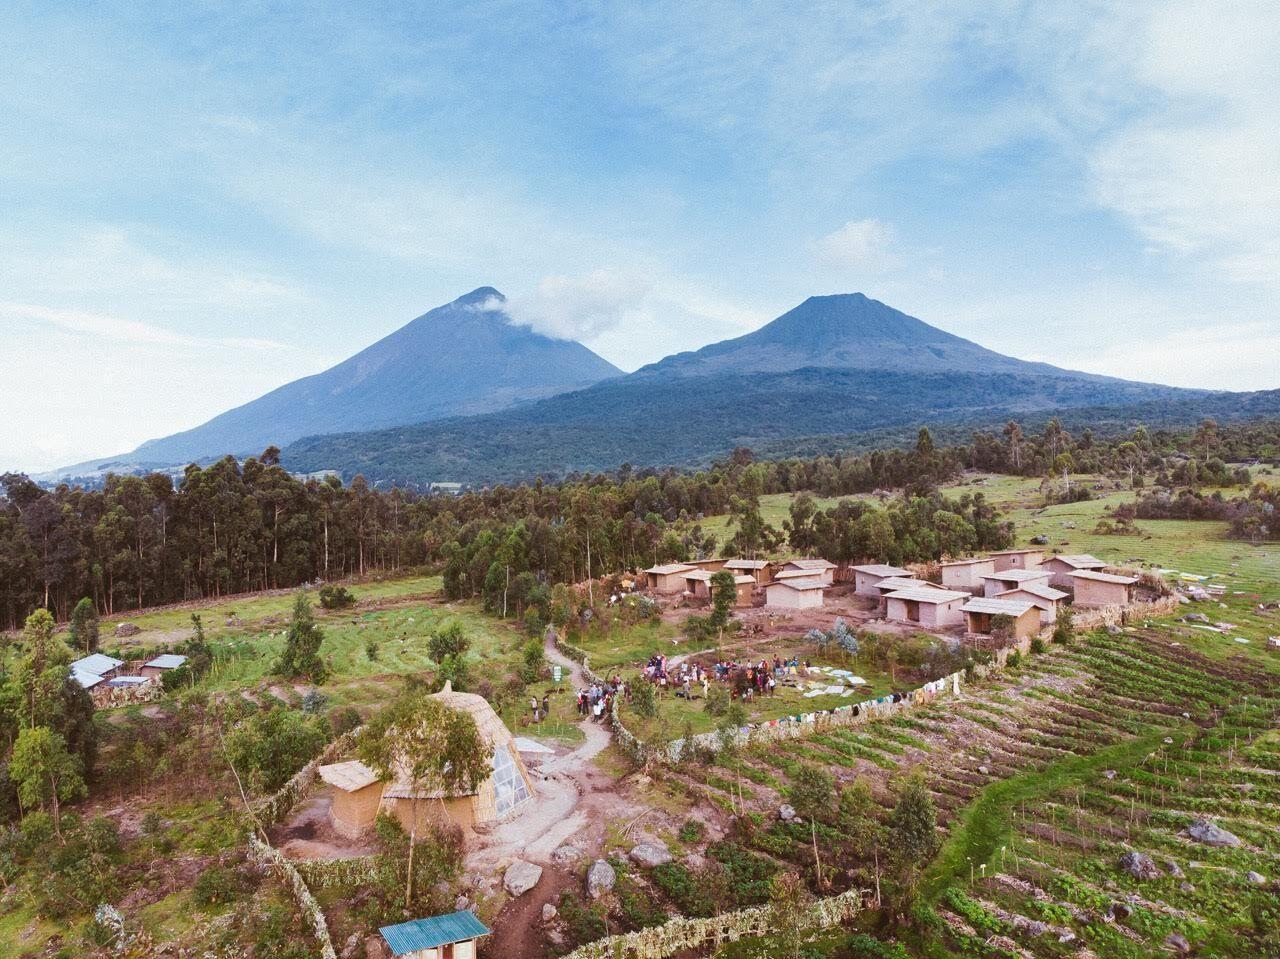 Volcanoes Safaris Partnership Trust - Restoring hope to the Gahinga community in Uganda